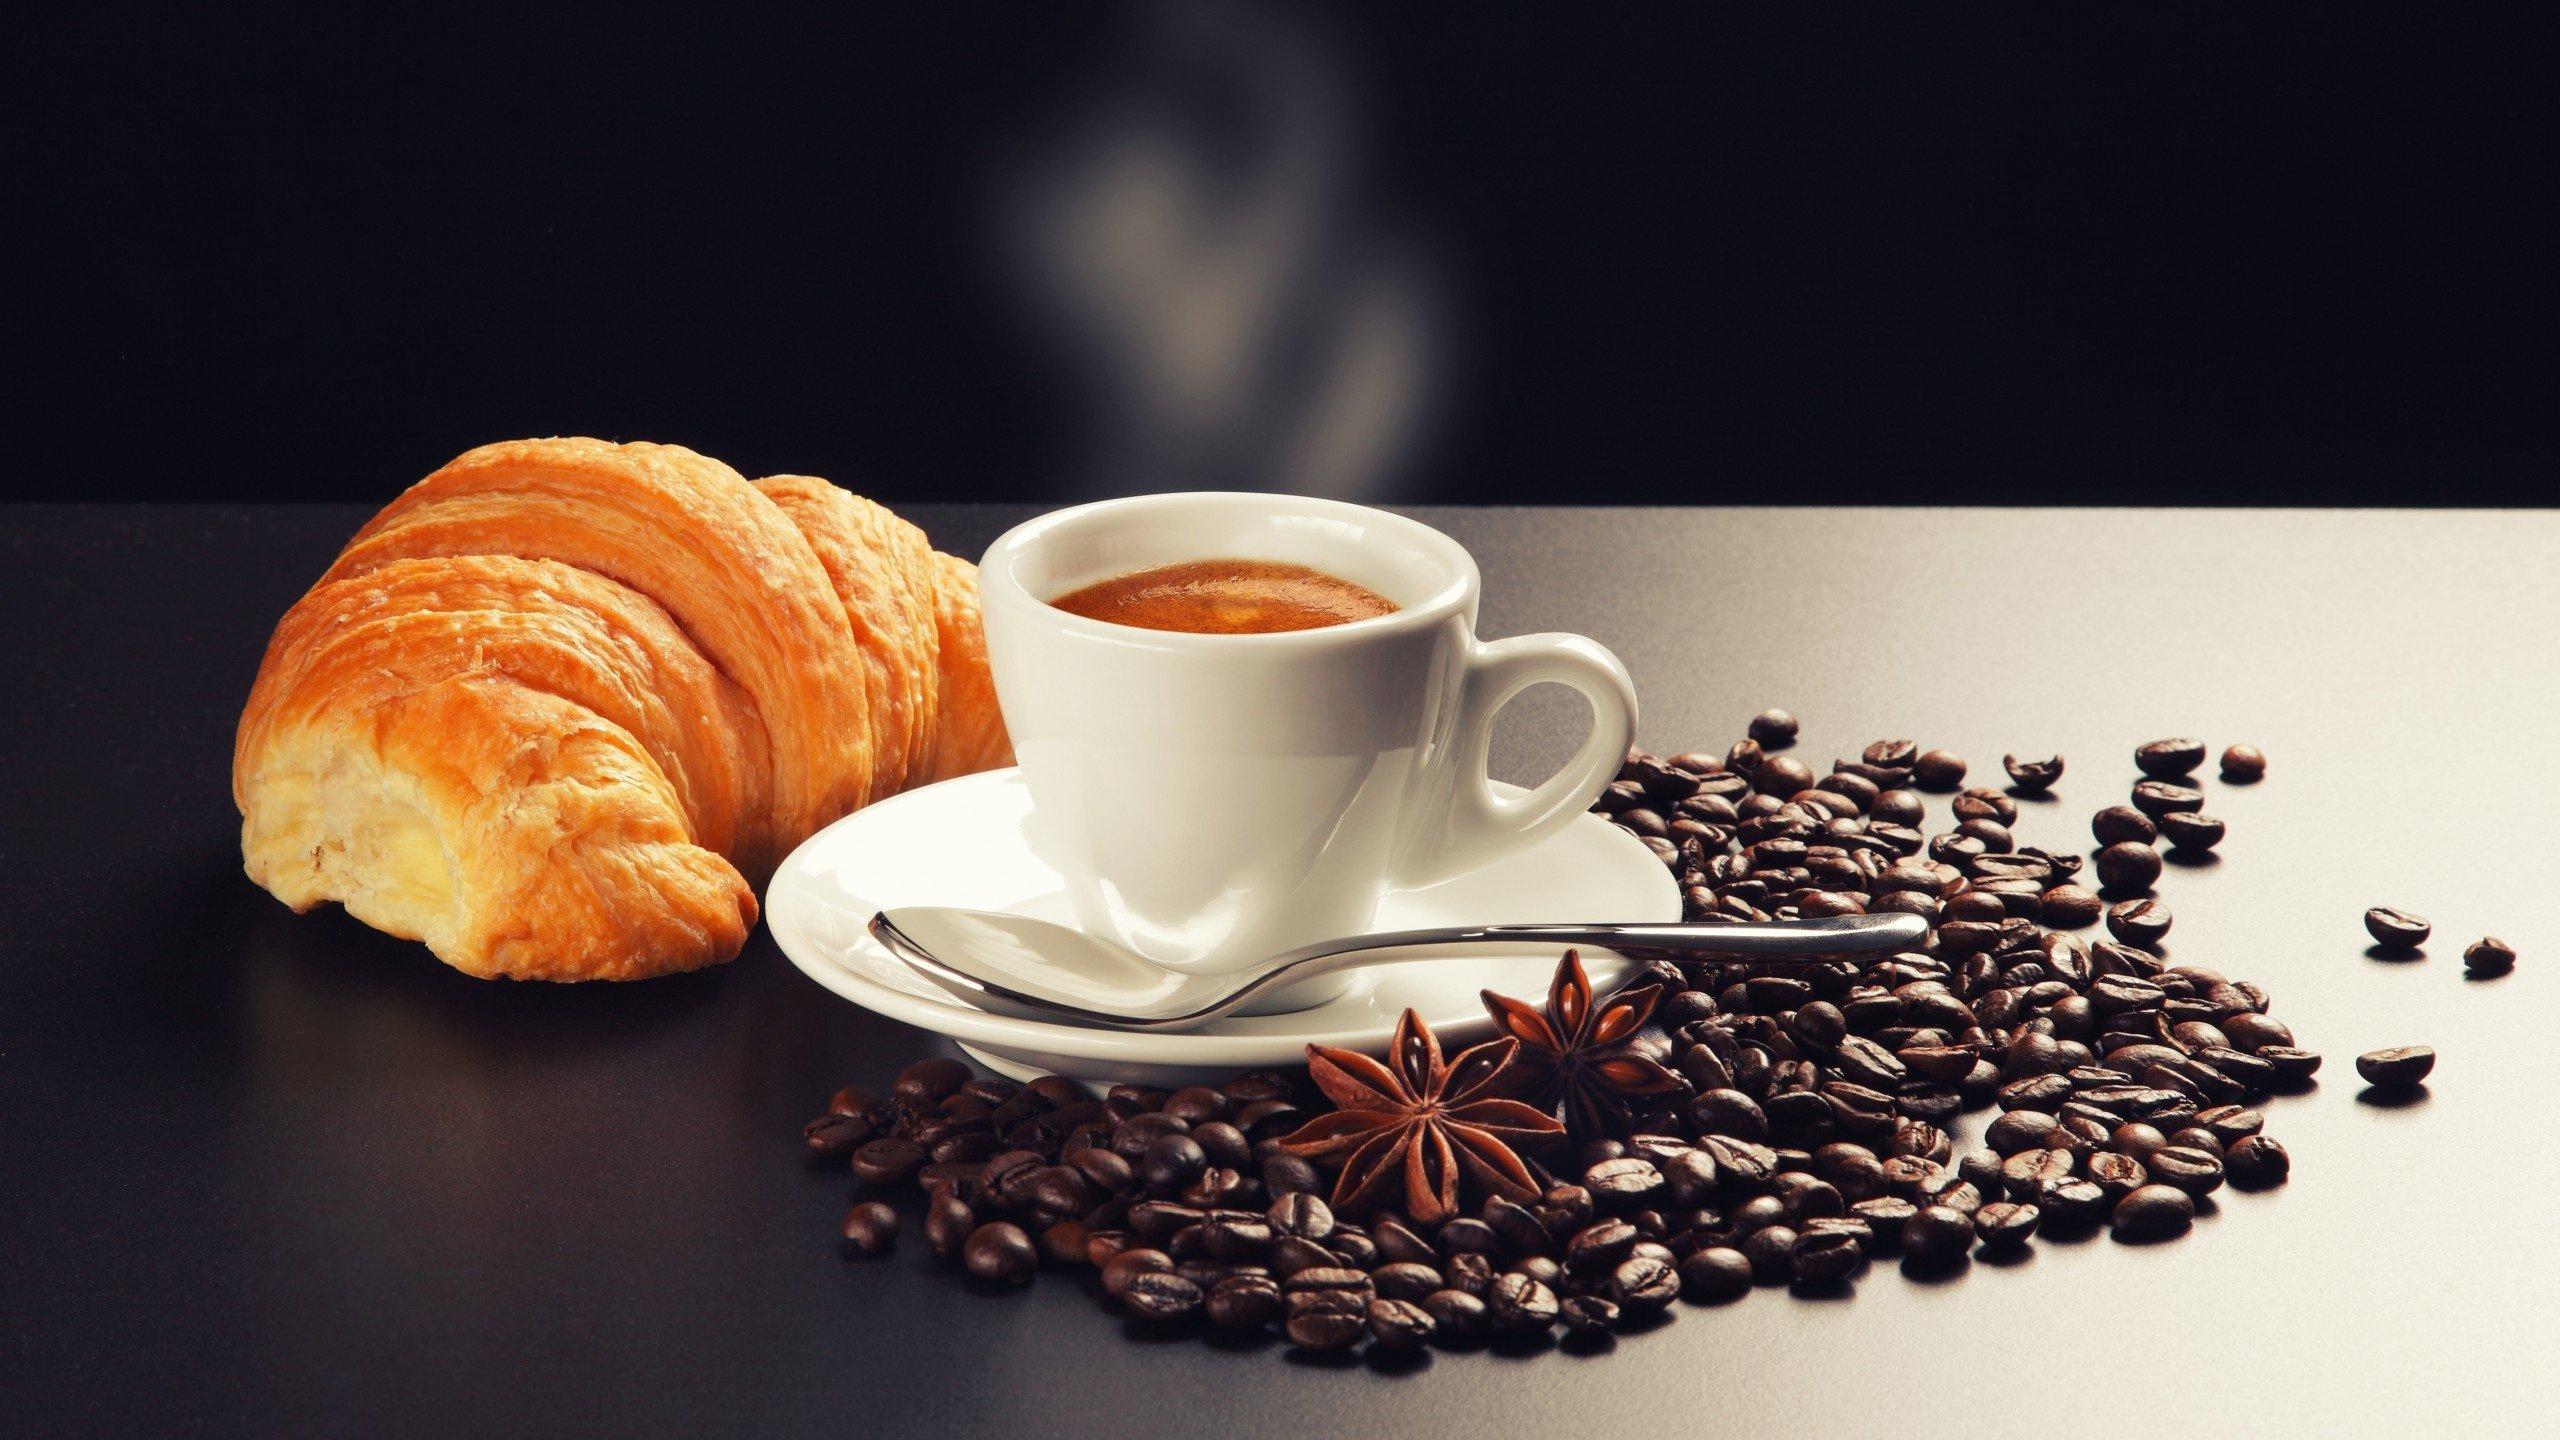 еда круасаны кофе зерна скачать